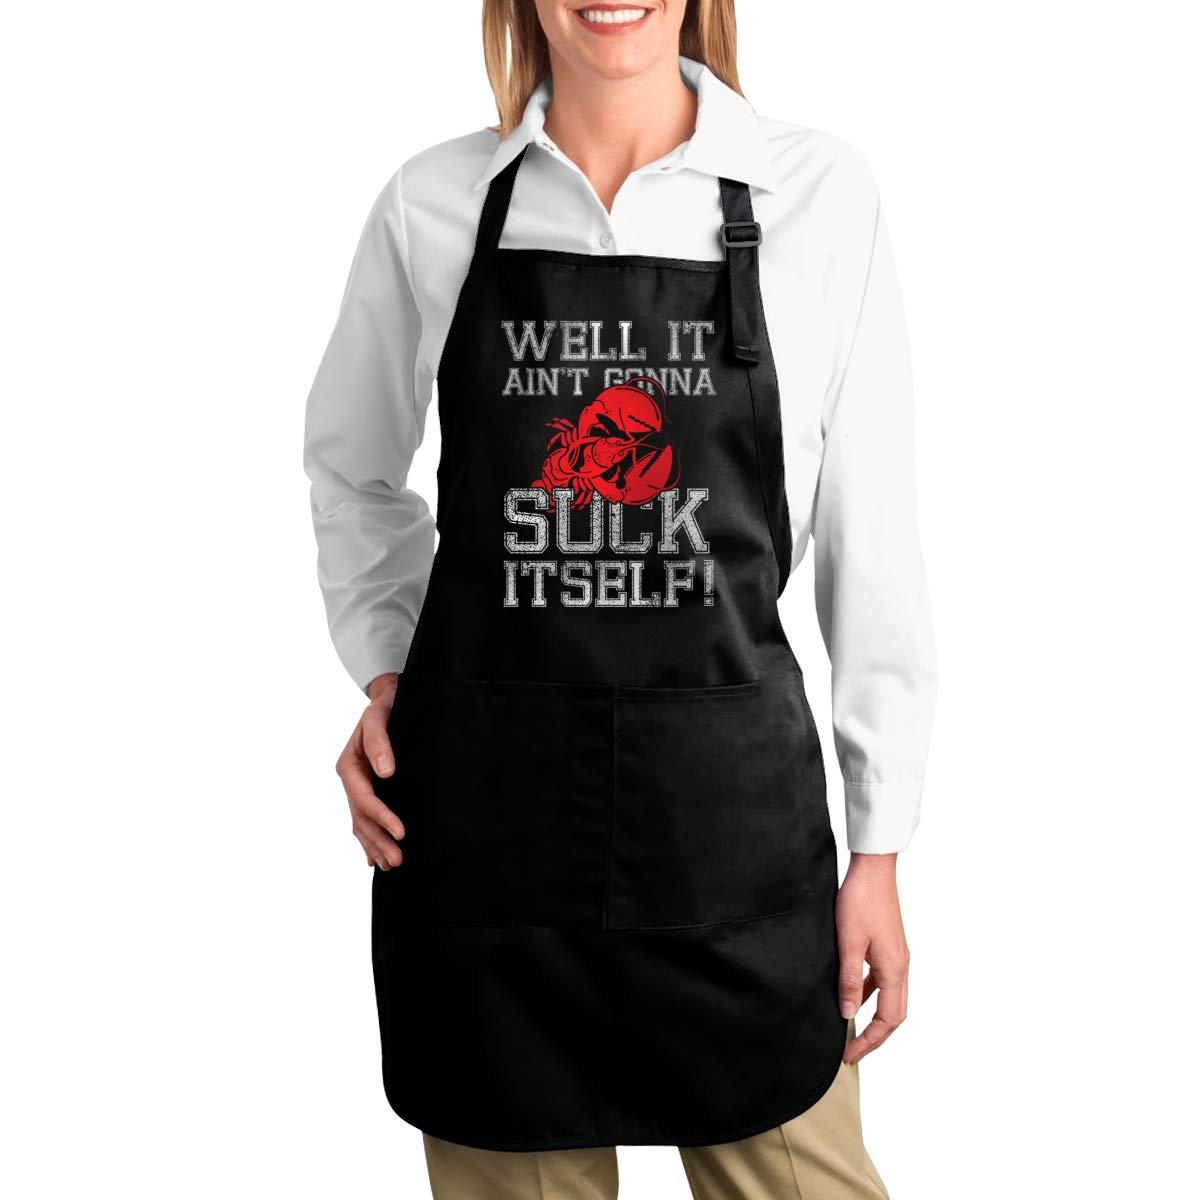 149b6df51 Amazon.com: FOECBIR Well It Gonna Suck Itself Crawfish Canvas Kitchen Chef  Bib with Pocket Adjustable for Cooking: Home & Kitchen